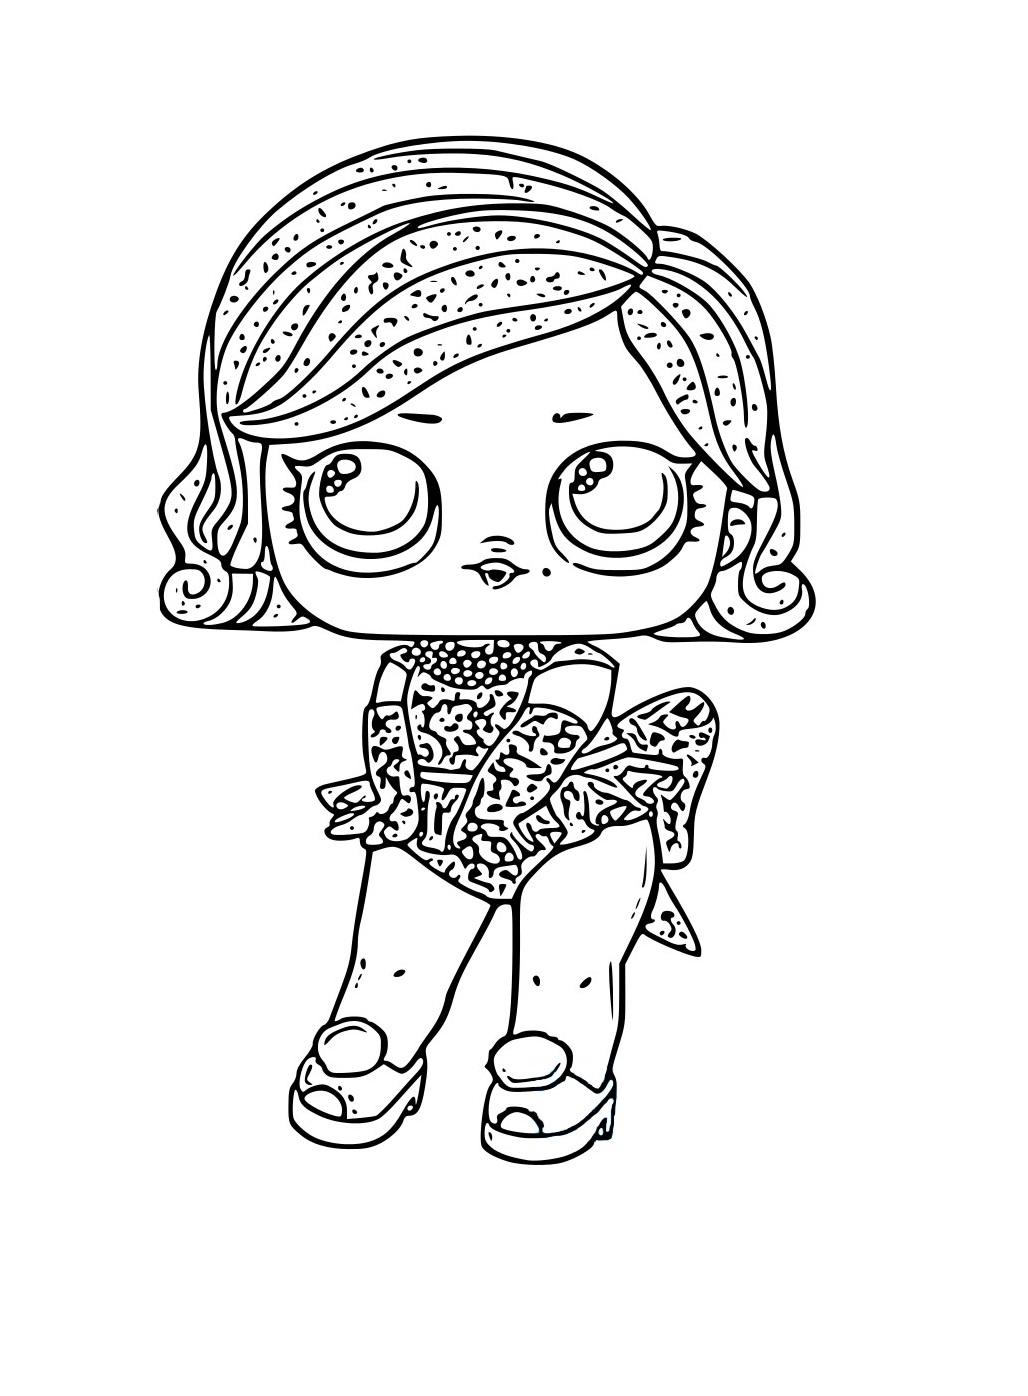 ЛОЛ блестящая - Куклы LOL - Раскраски антистресс